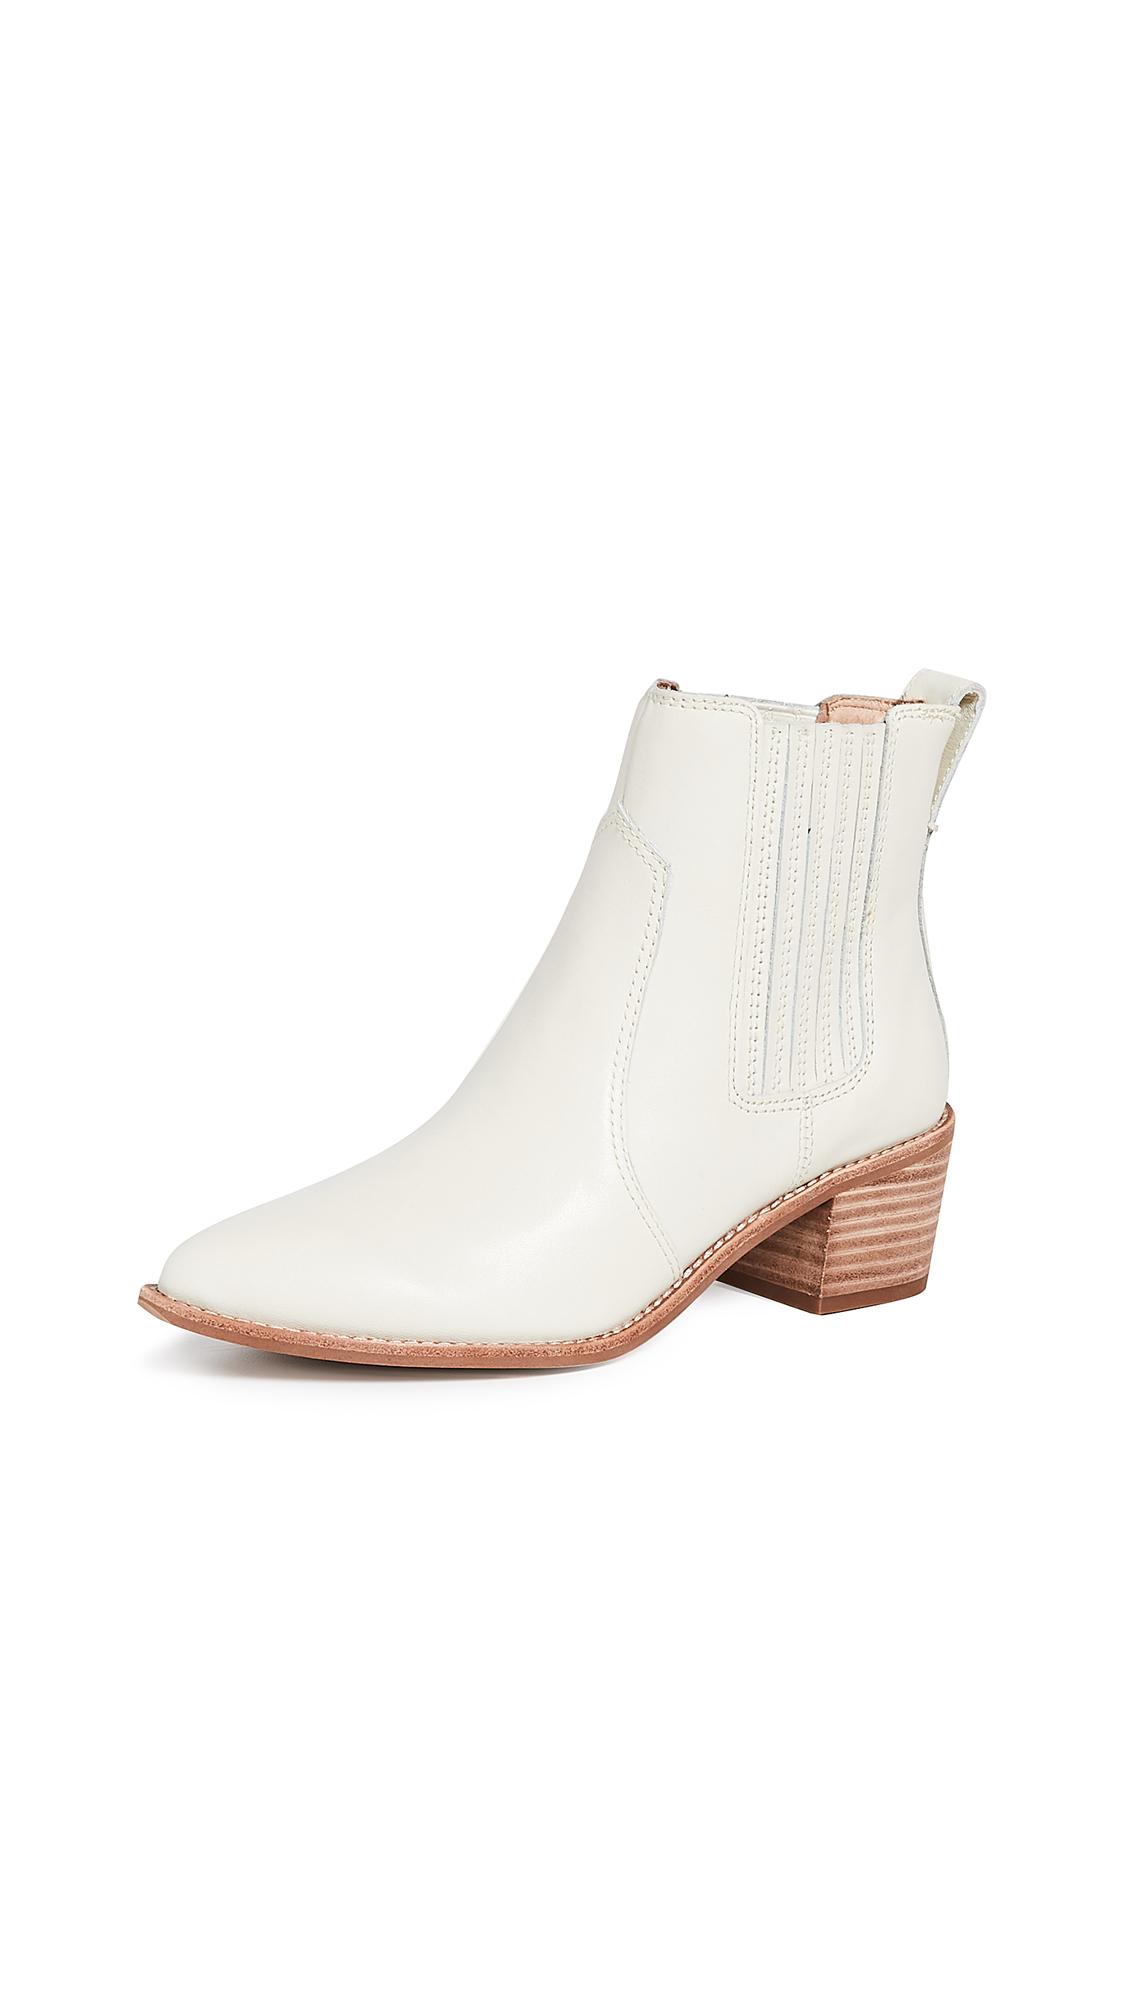 Madewell Ramsey Chelsea Boots